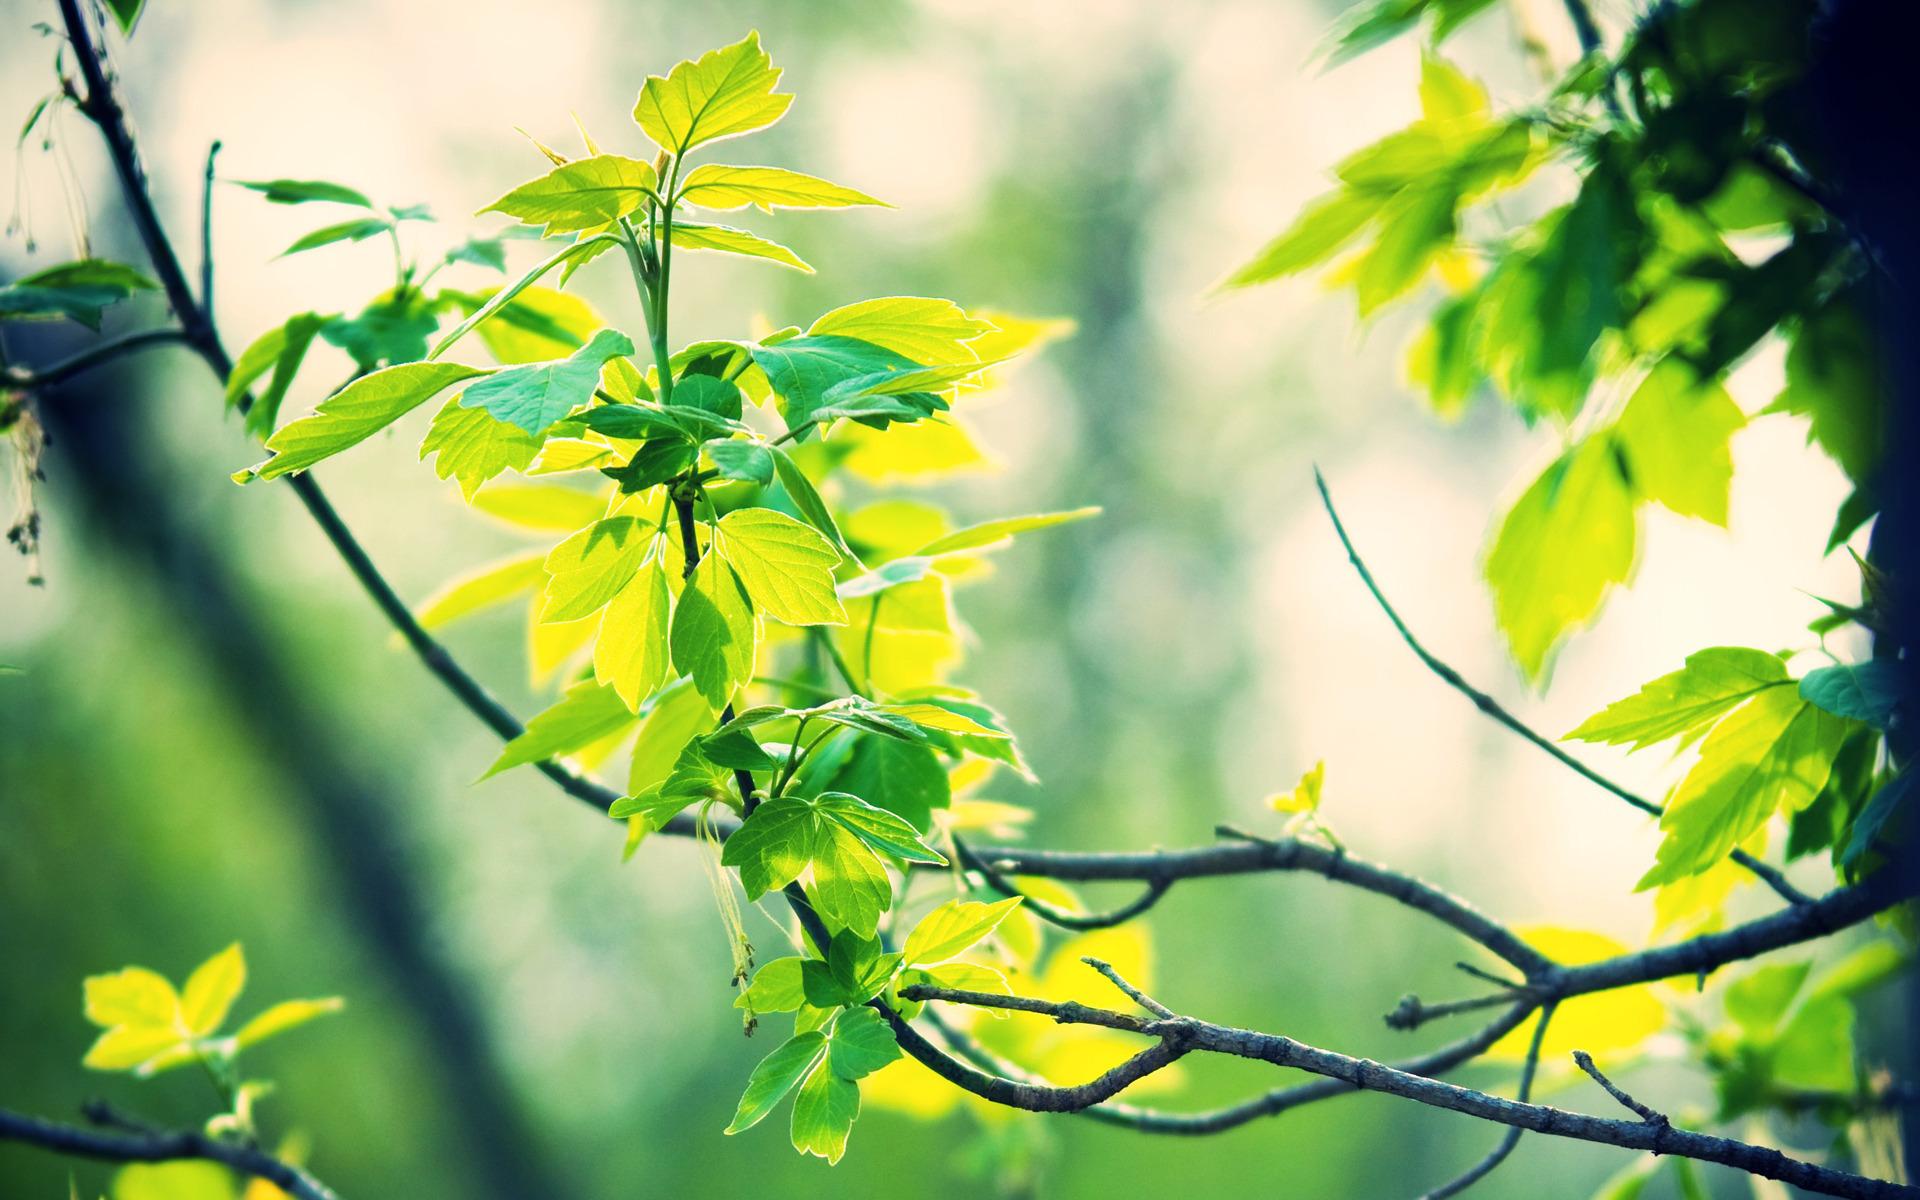 лес зелень ветви  № 2801097 бесплатно